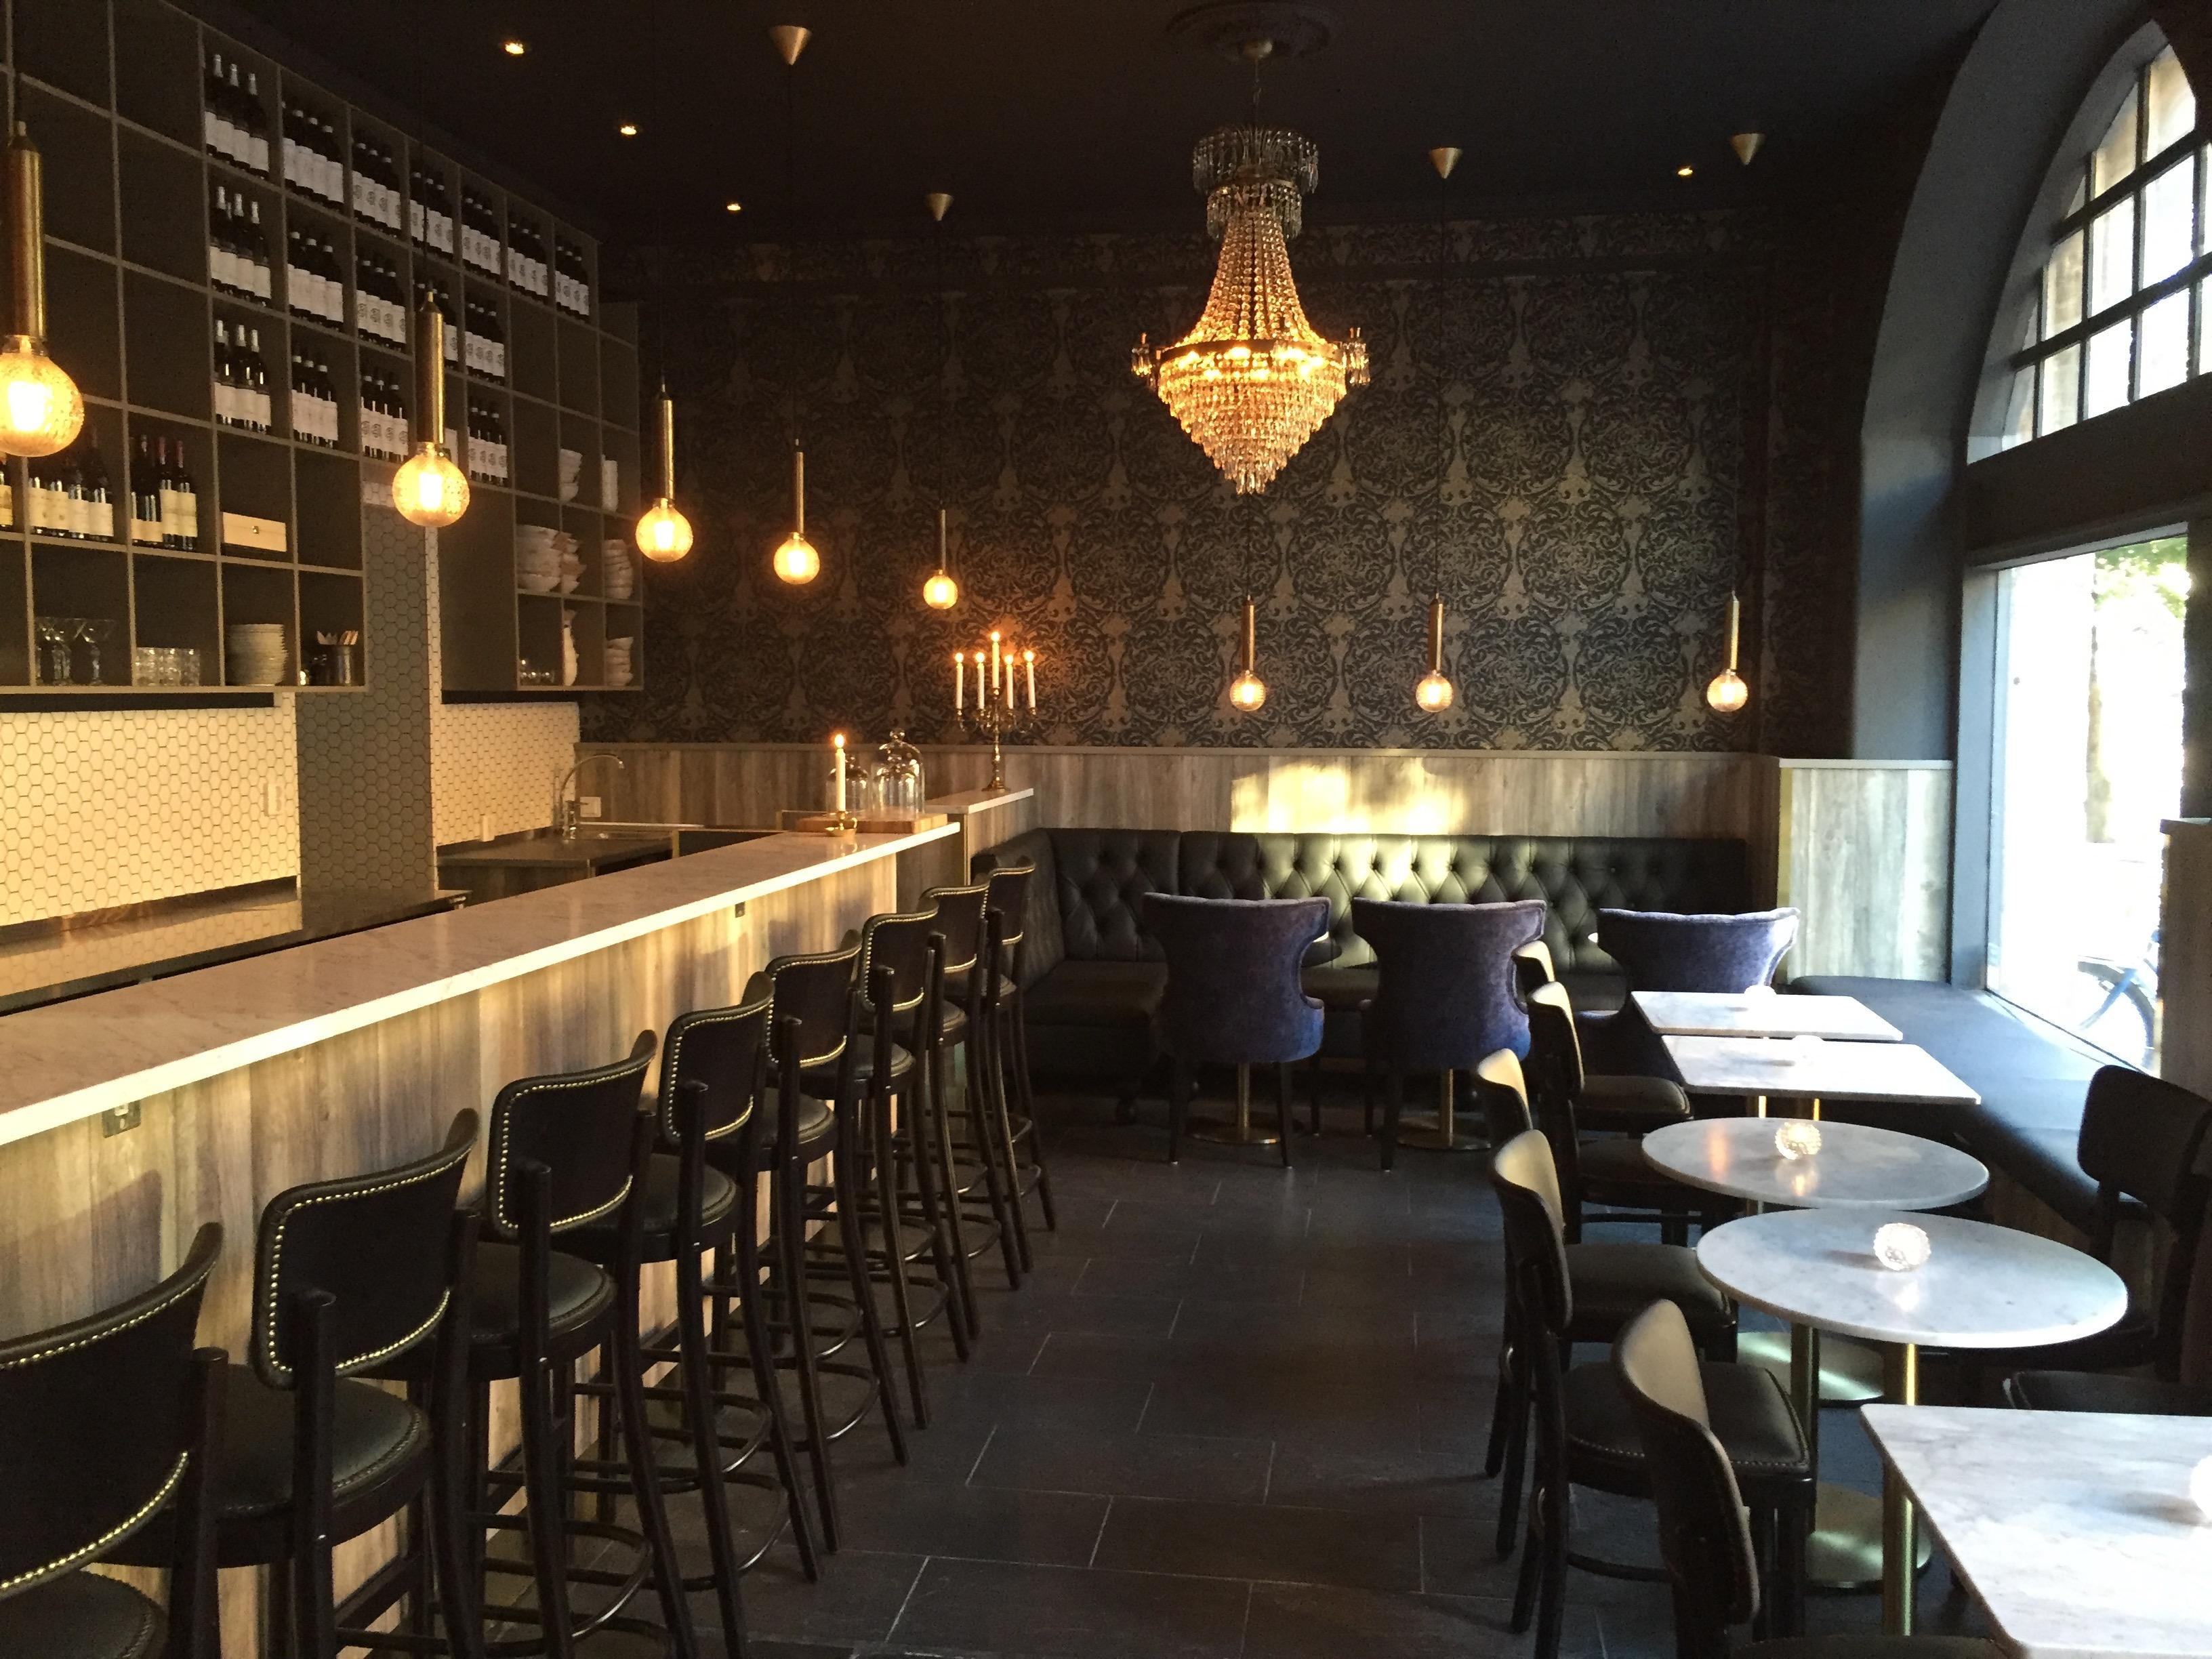 restauranger göteborg centralt karta Project | Restaurang i Göteborg restauranger göteborg centralt karta